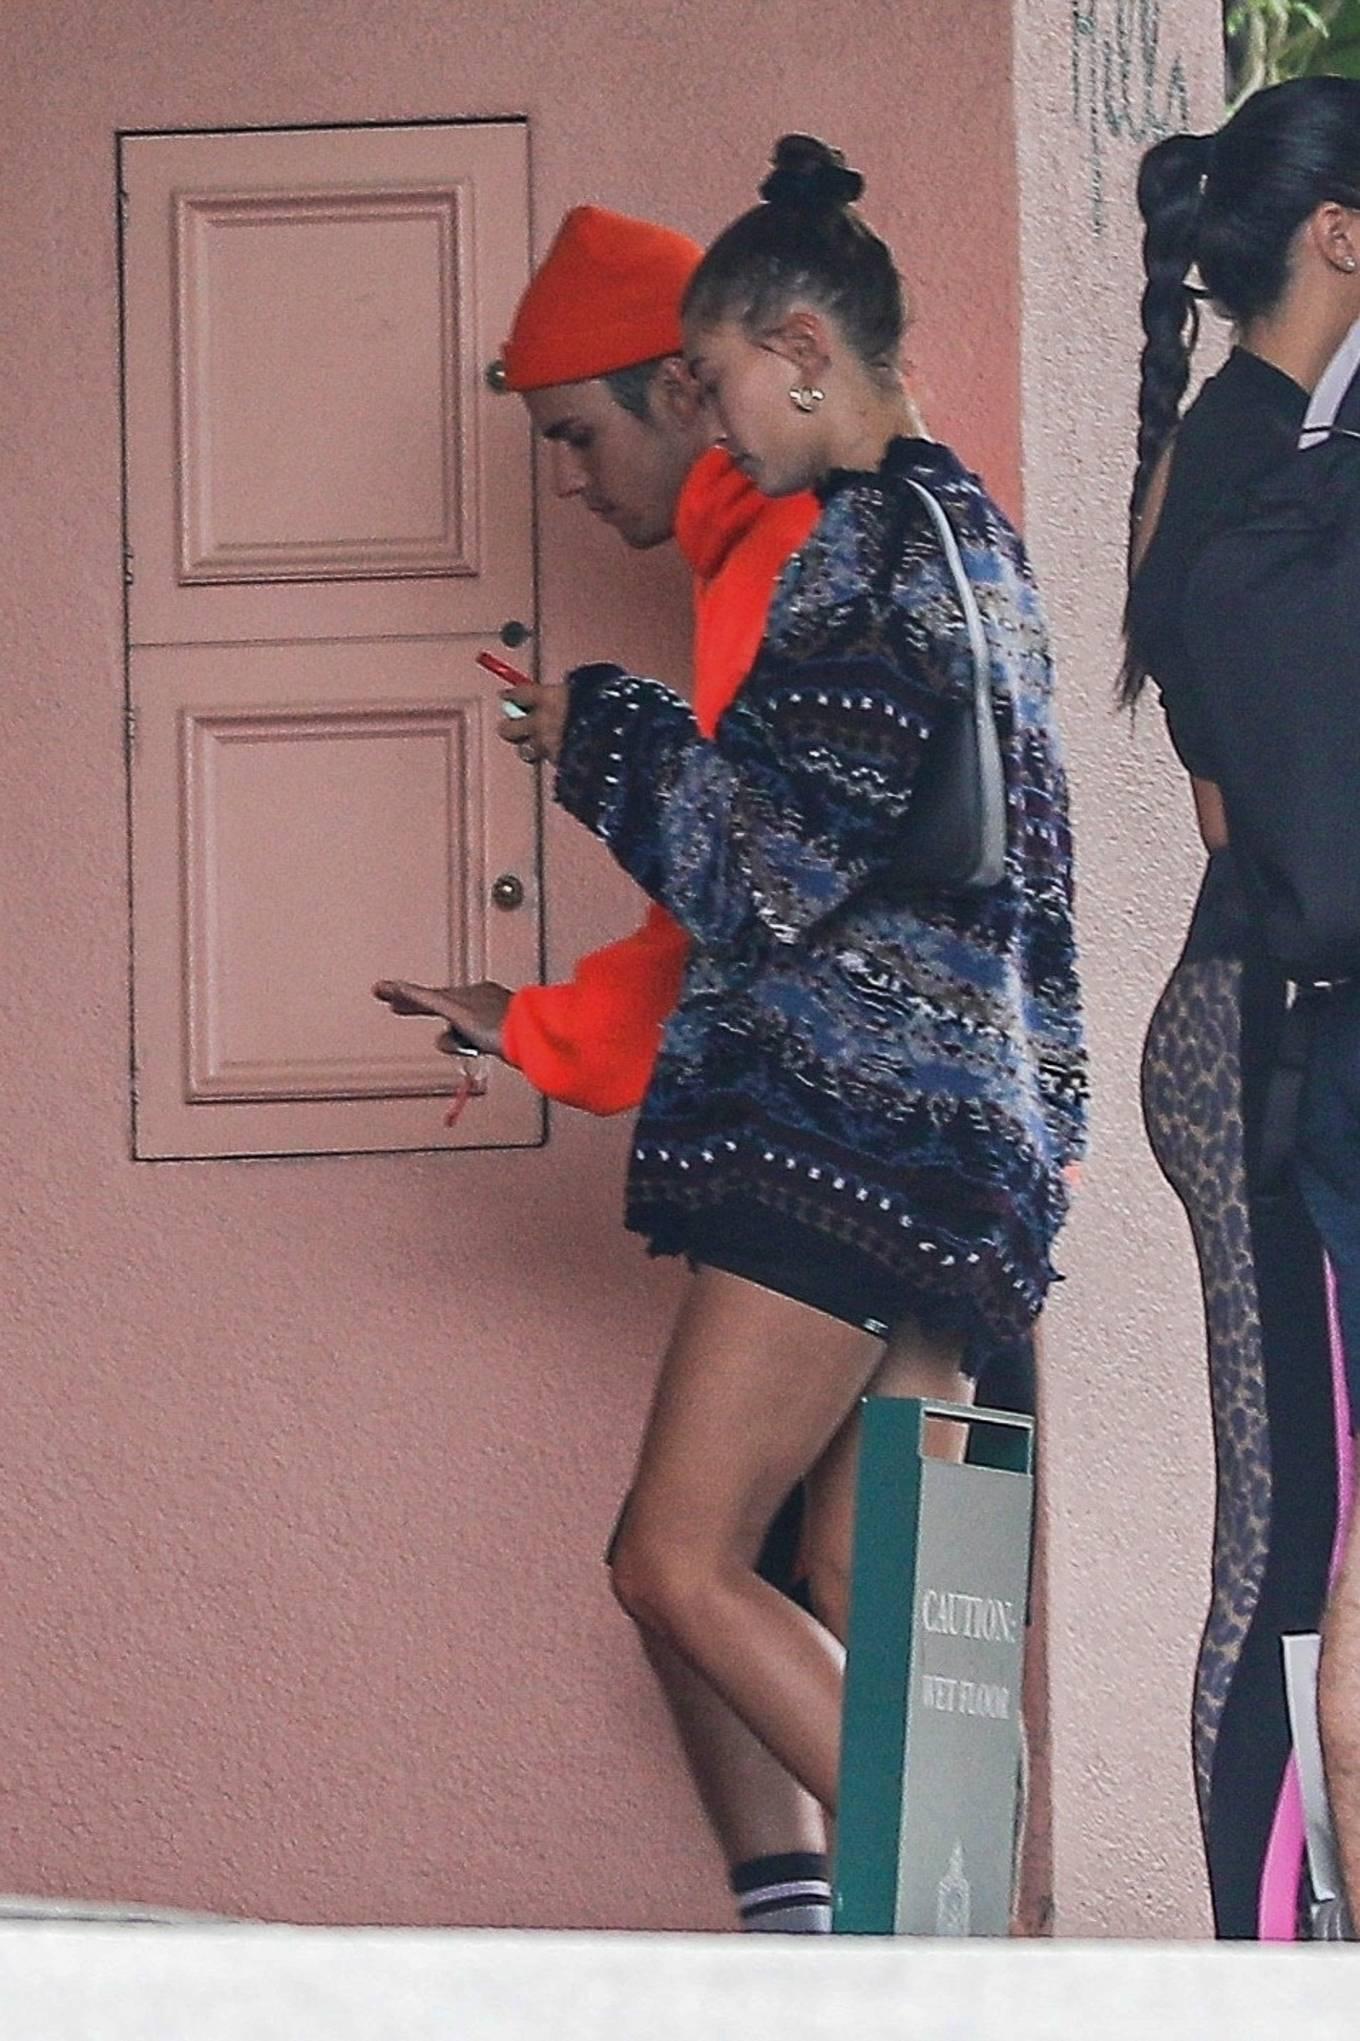 Hailey Baldwin wearing fitted black high rise shorts